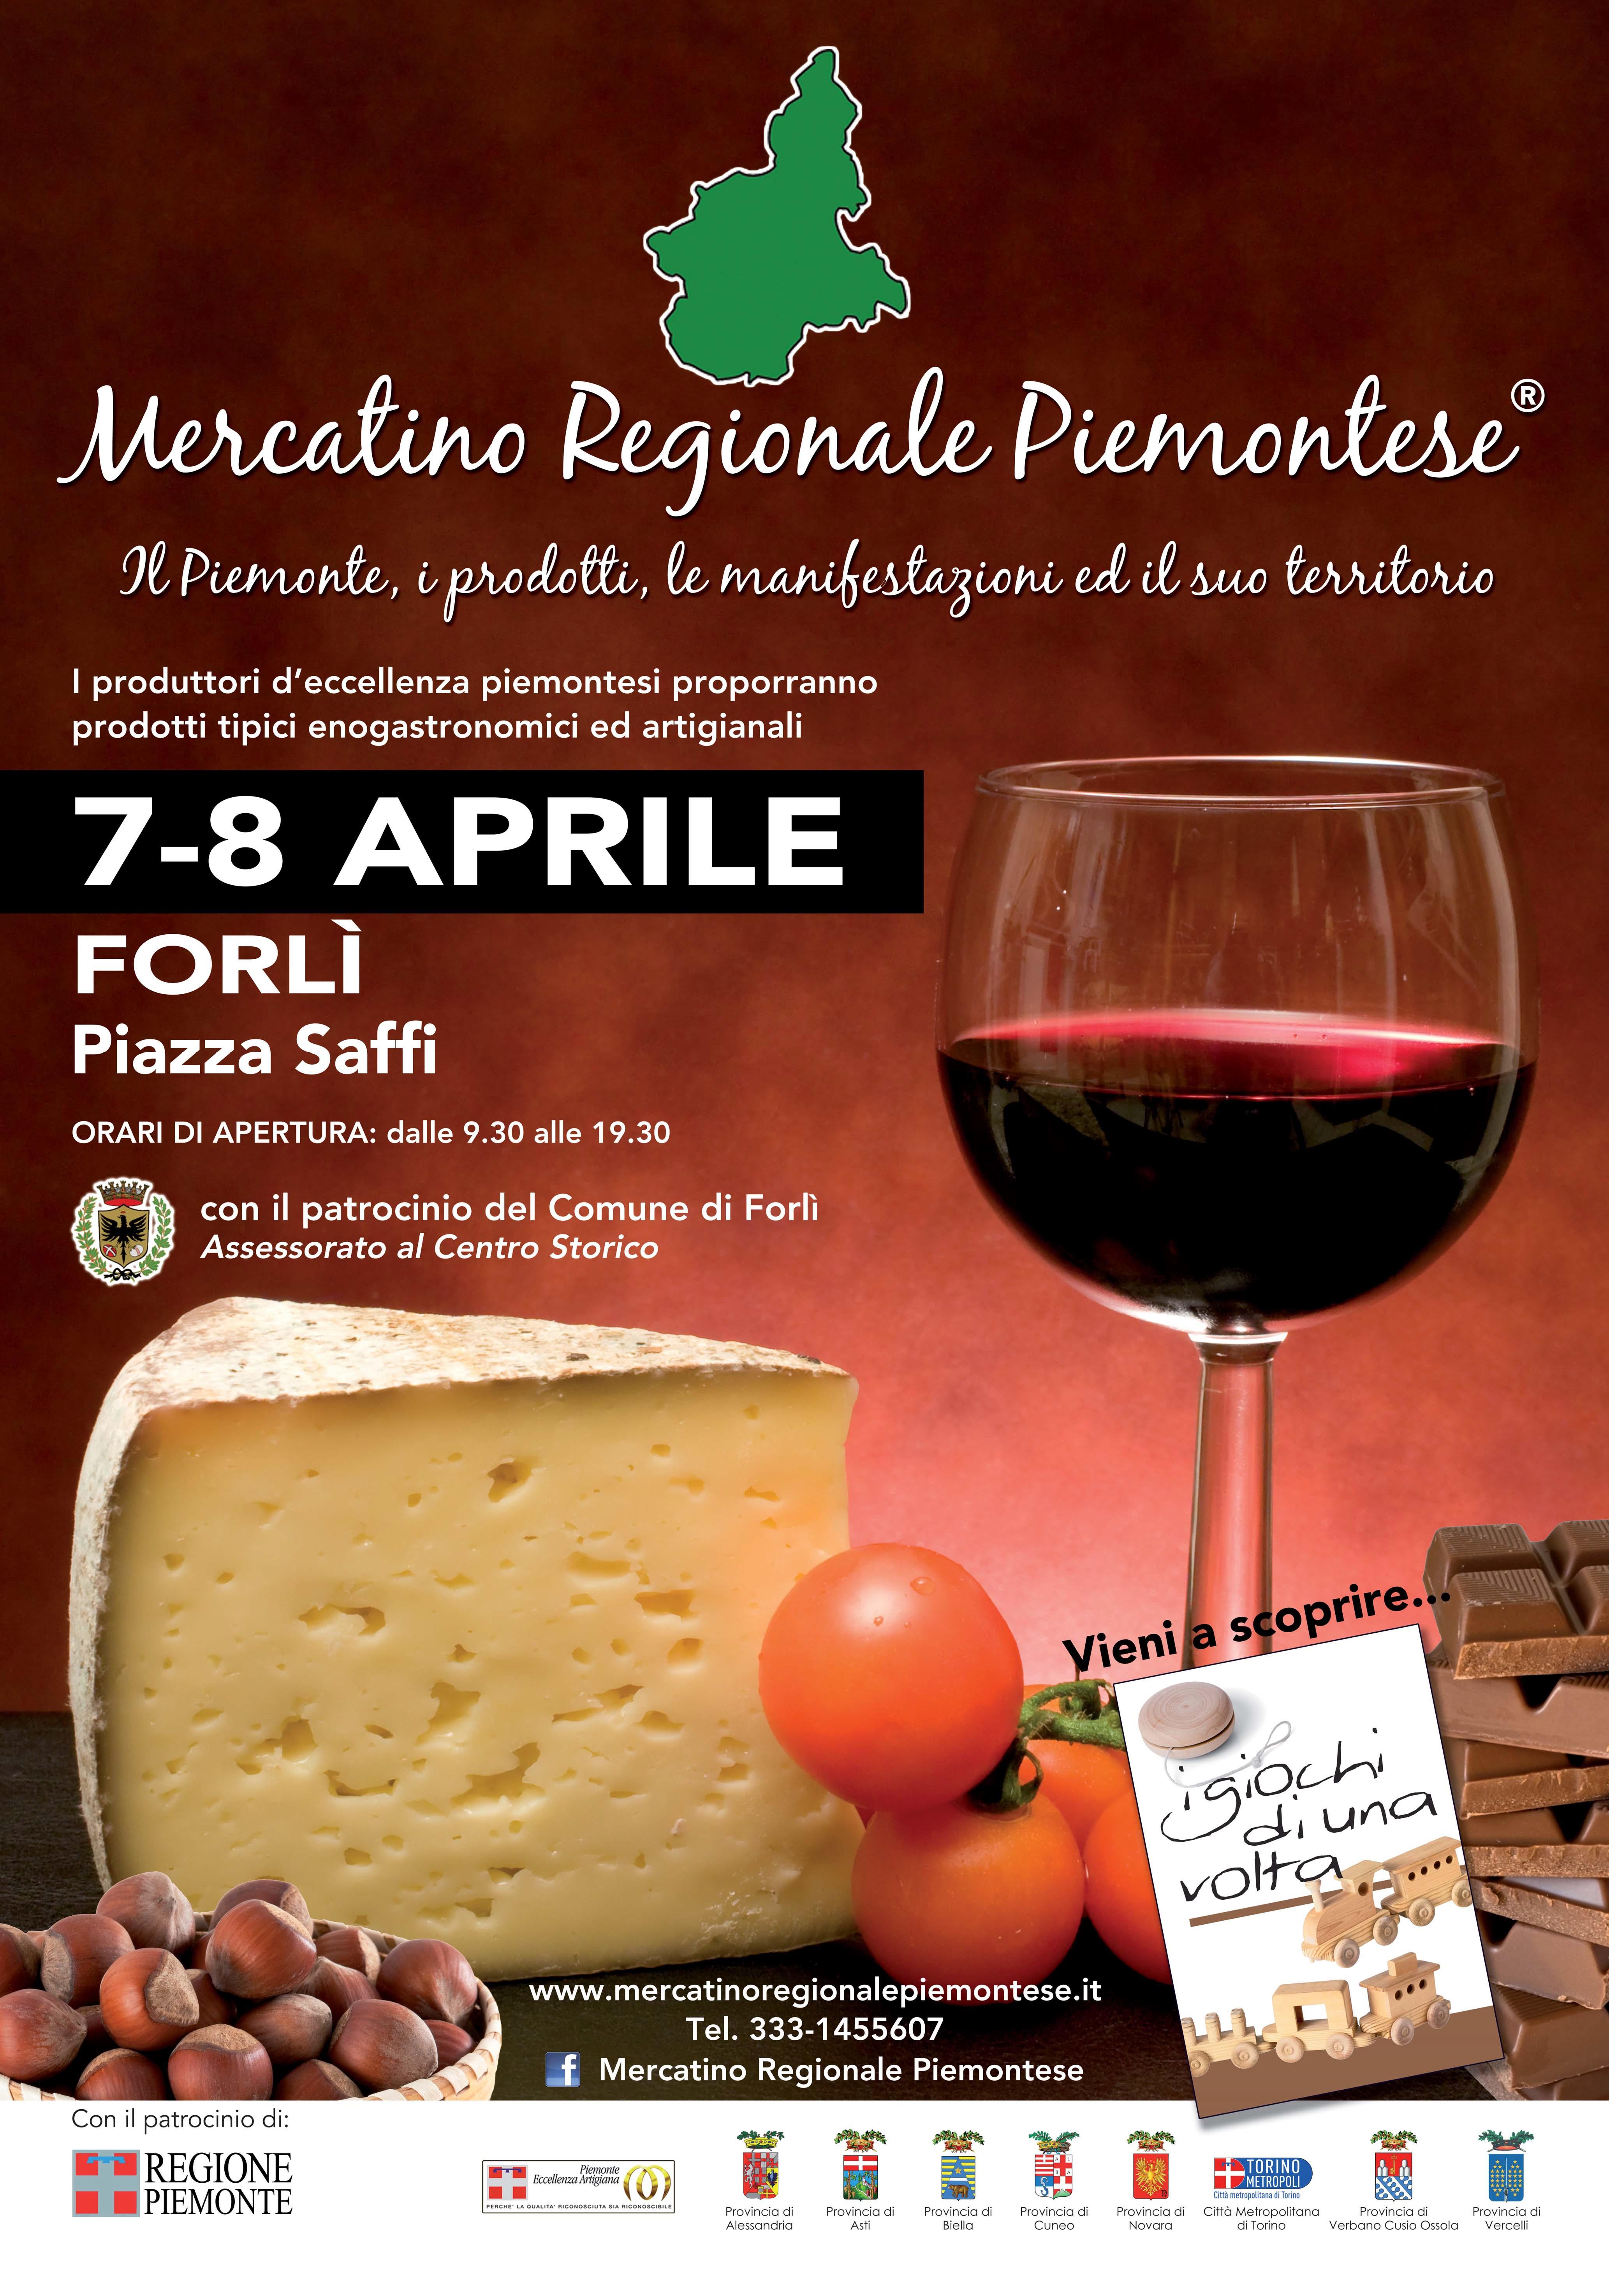 Mercatino Regionale Piemontese a Forlì